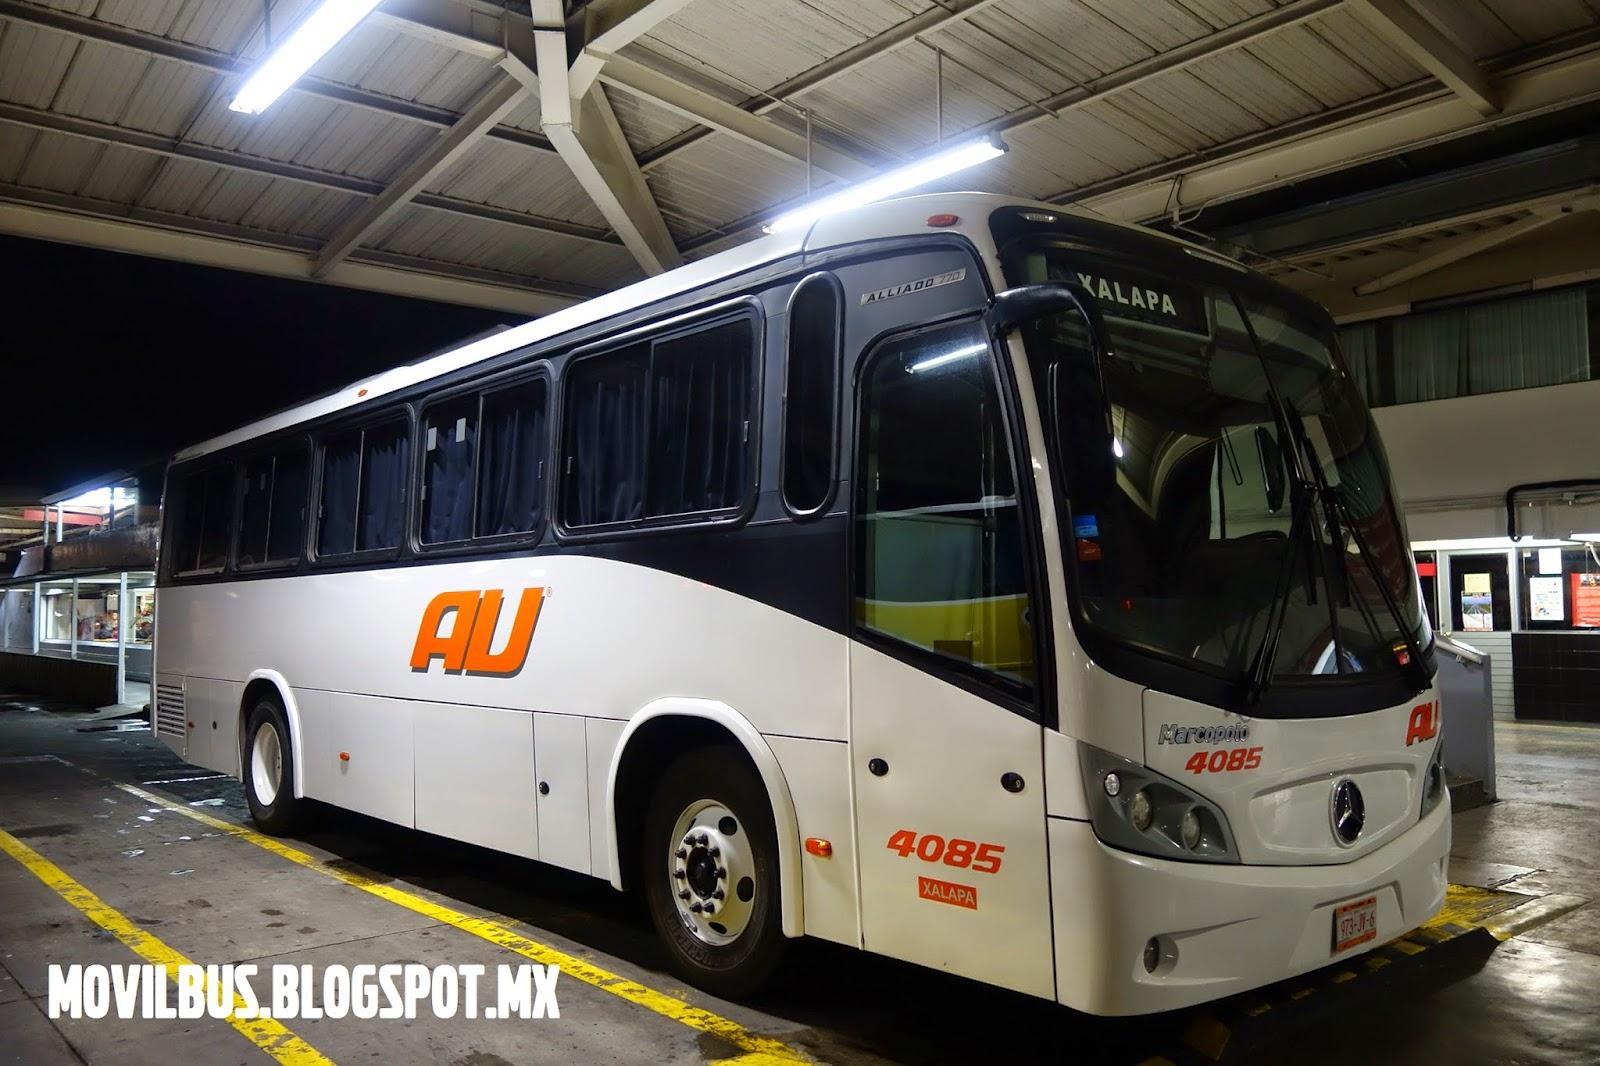 MOVILBUS: MERCEDES BENZ MARCOPOLO ALLIADO 770 AUTOBUSES UNIDOS.